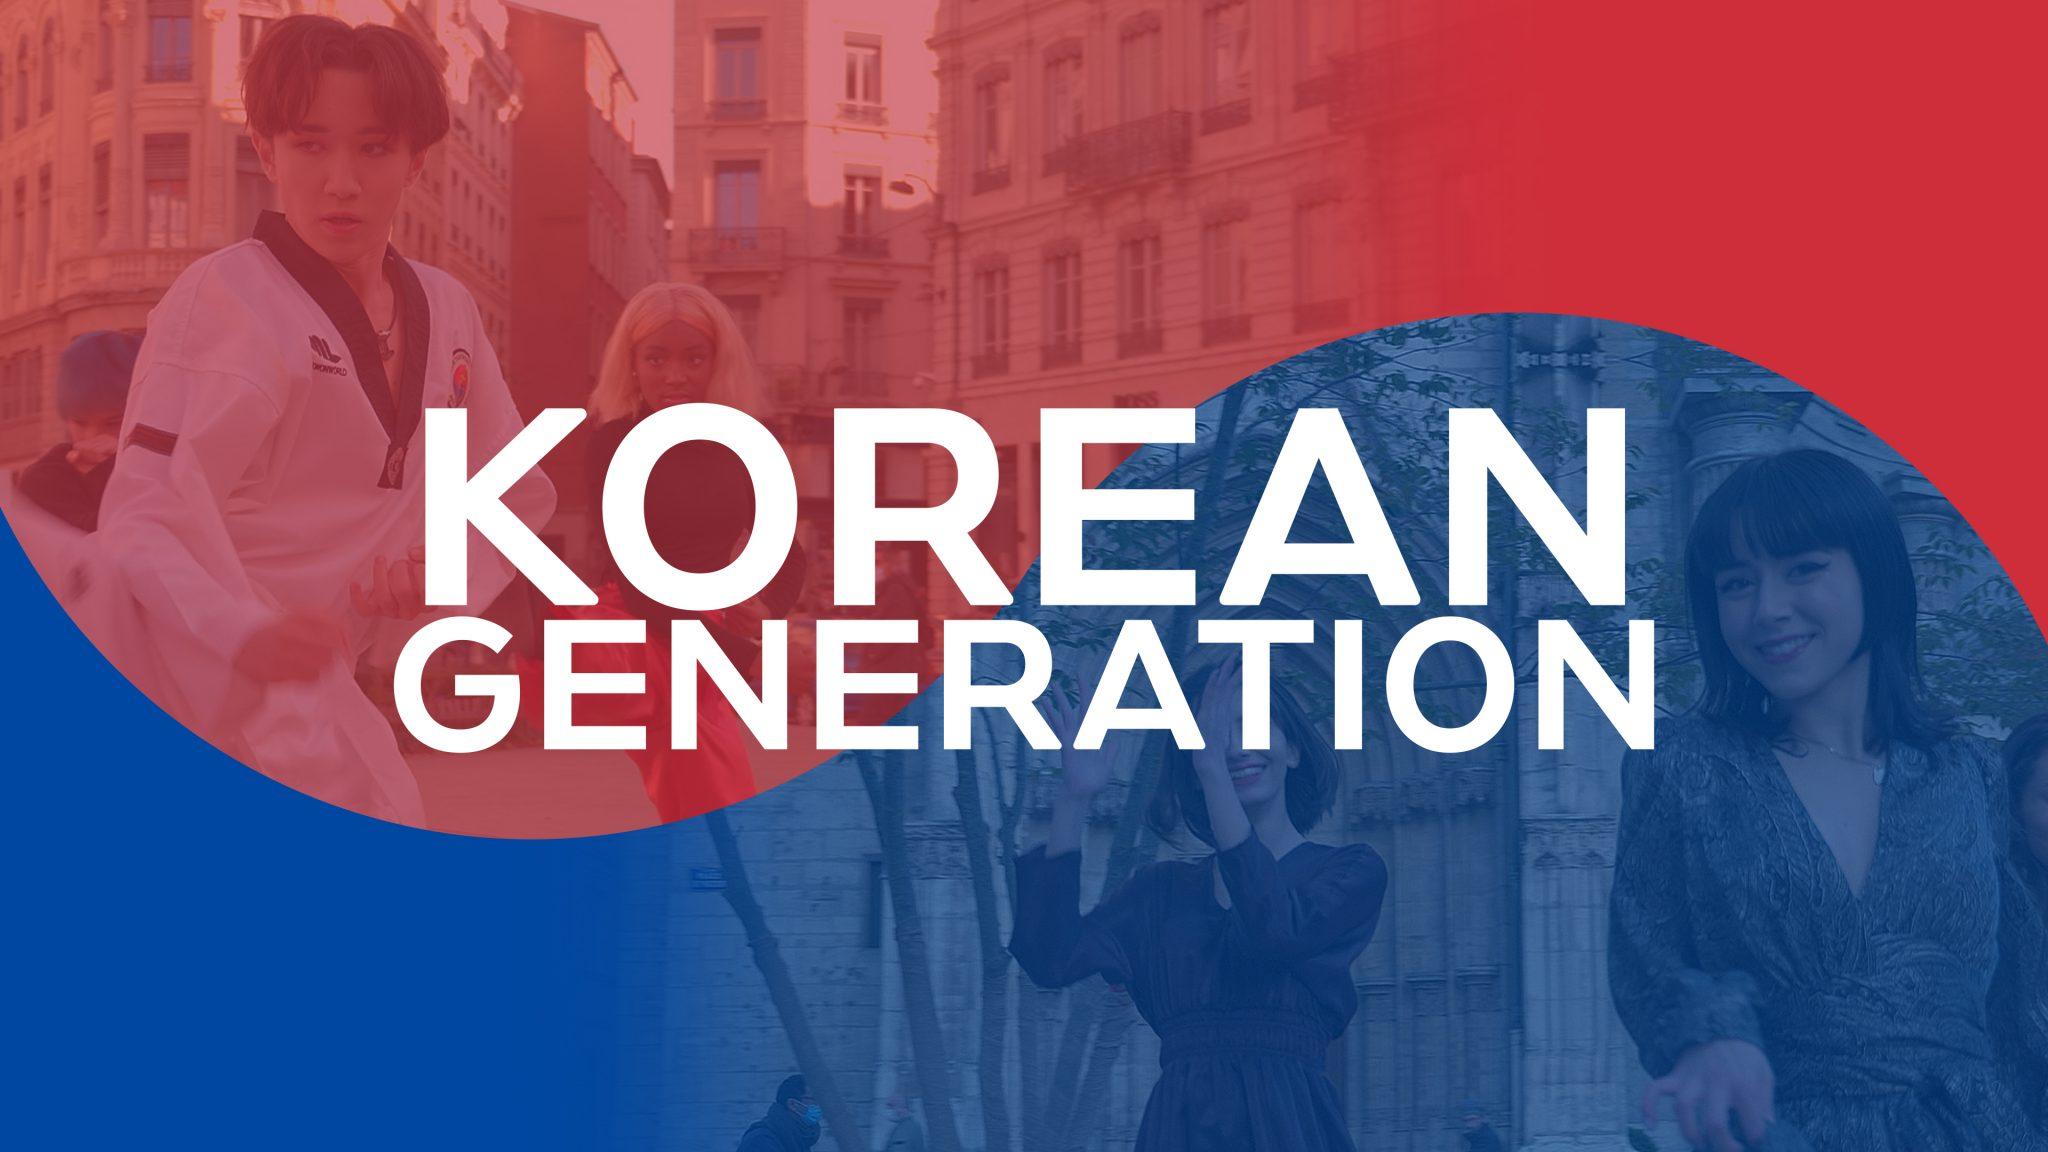 Korean Generation